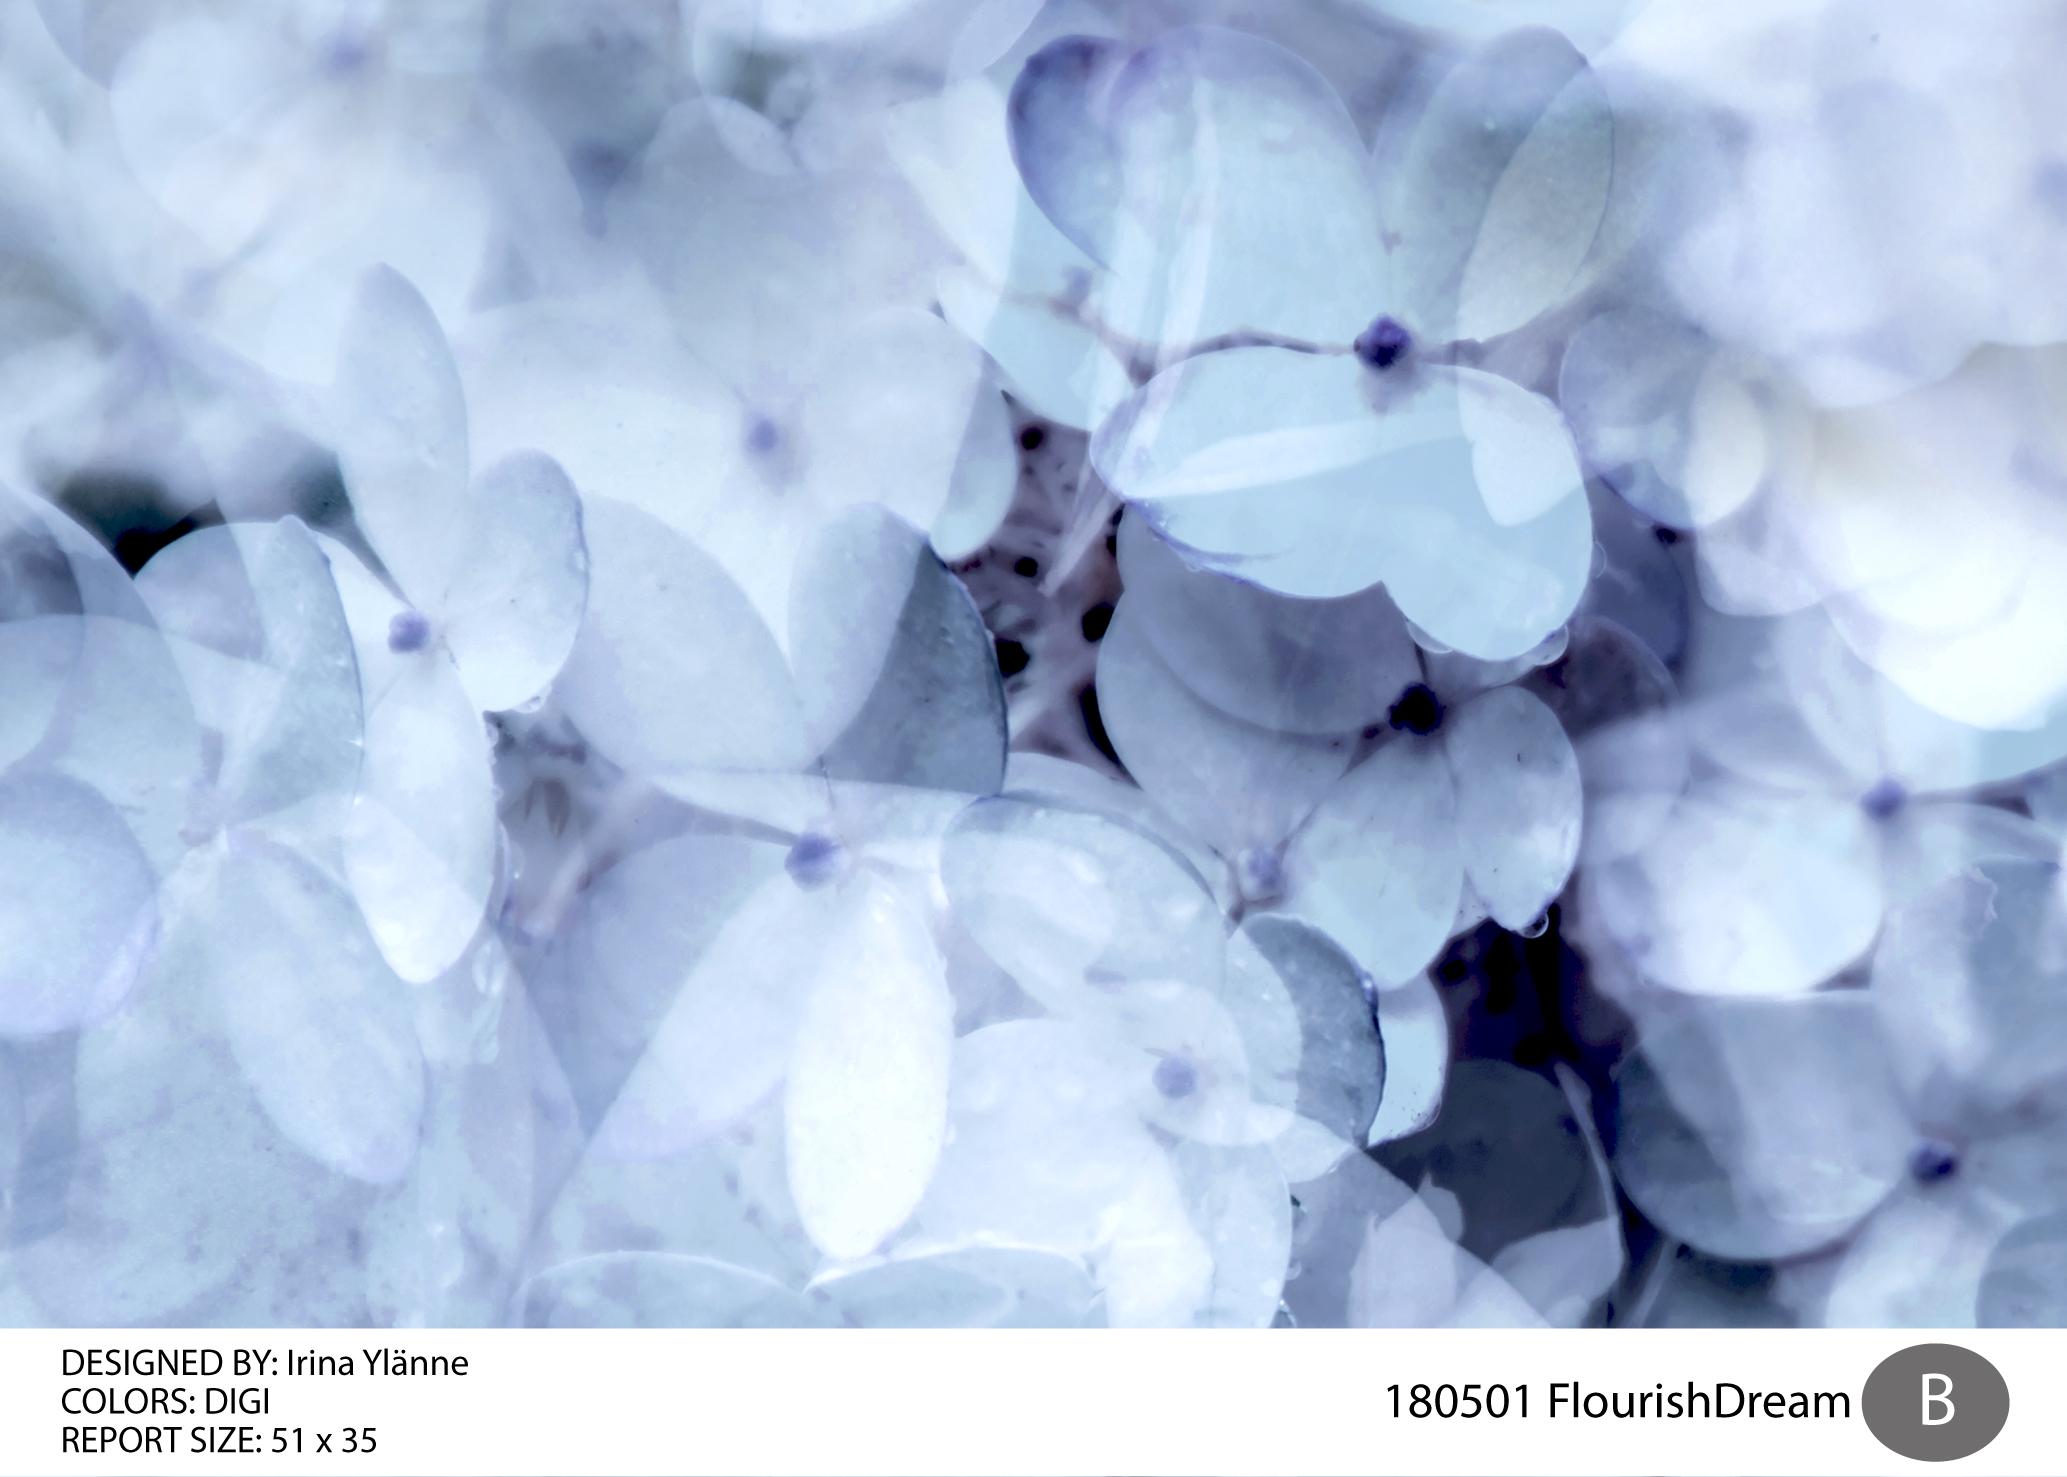 irinas_FlourushDream-01